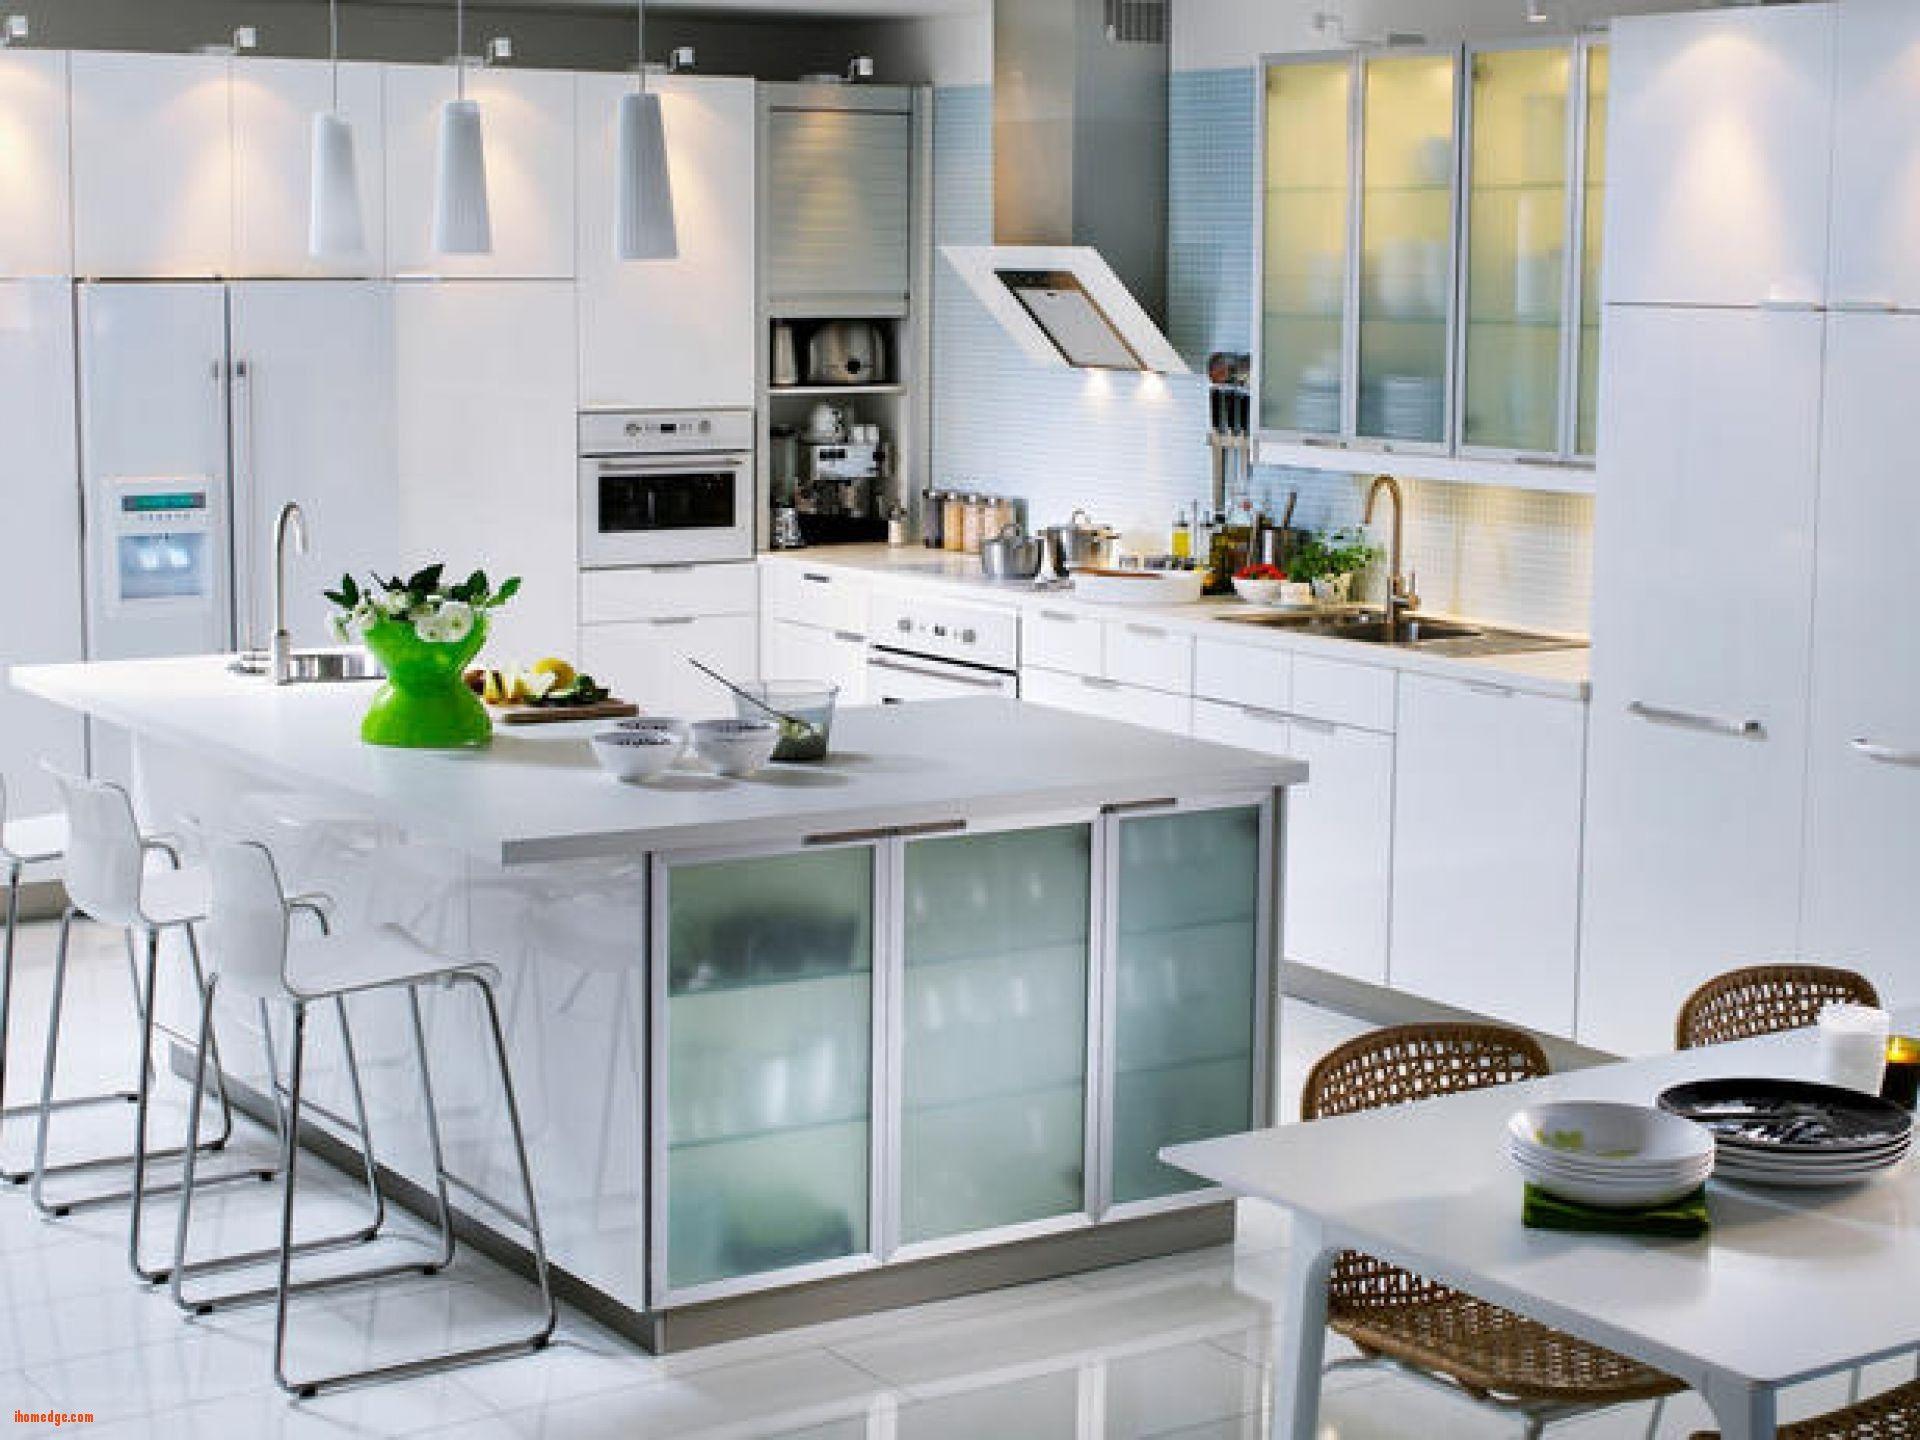 Inspirational Luxury Kitchen Design App  Free Kitchen Planning Stunning Kitchen Countertop Design Tool Inspiration